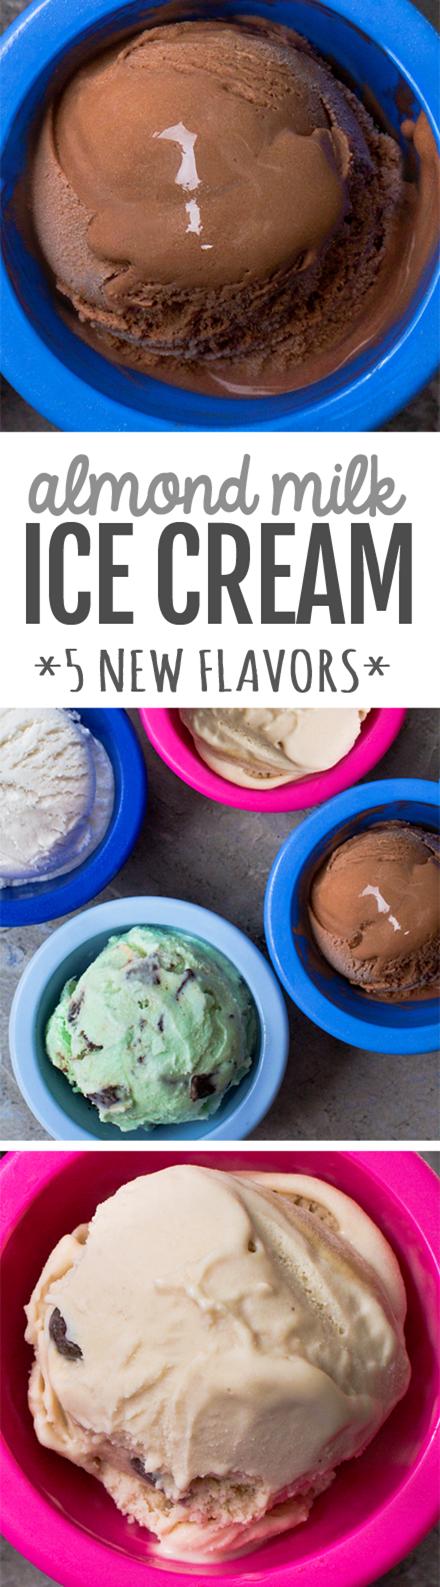 Almond Milk Ice Cream - 5 flavors, vegan, keto option